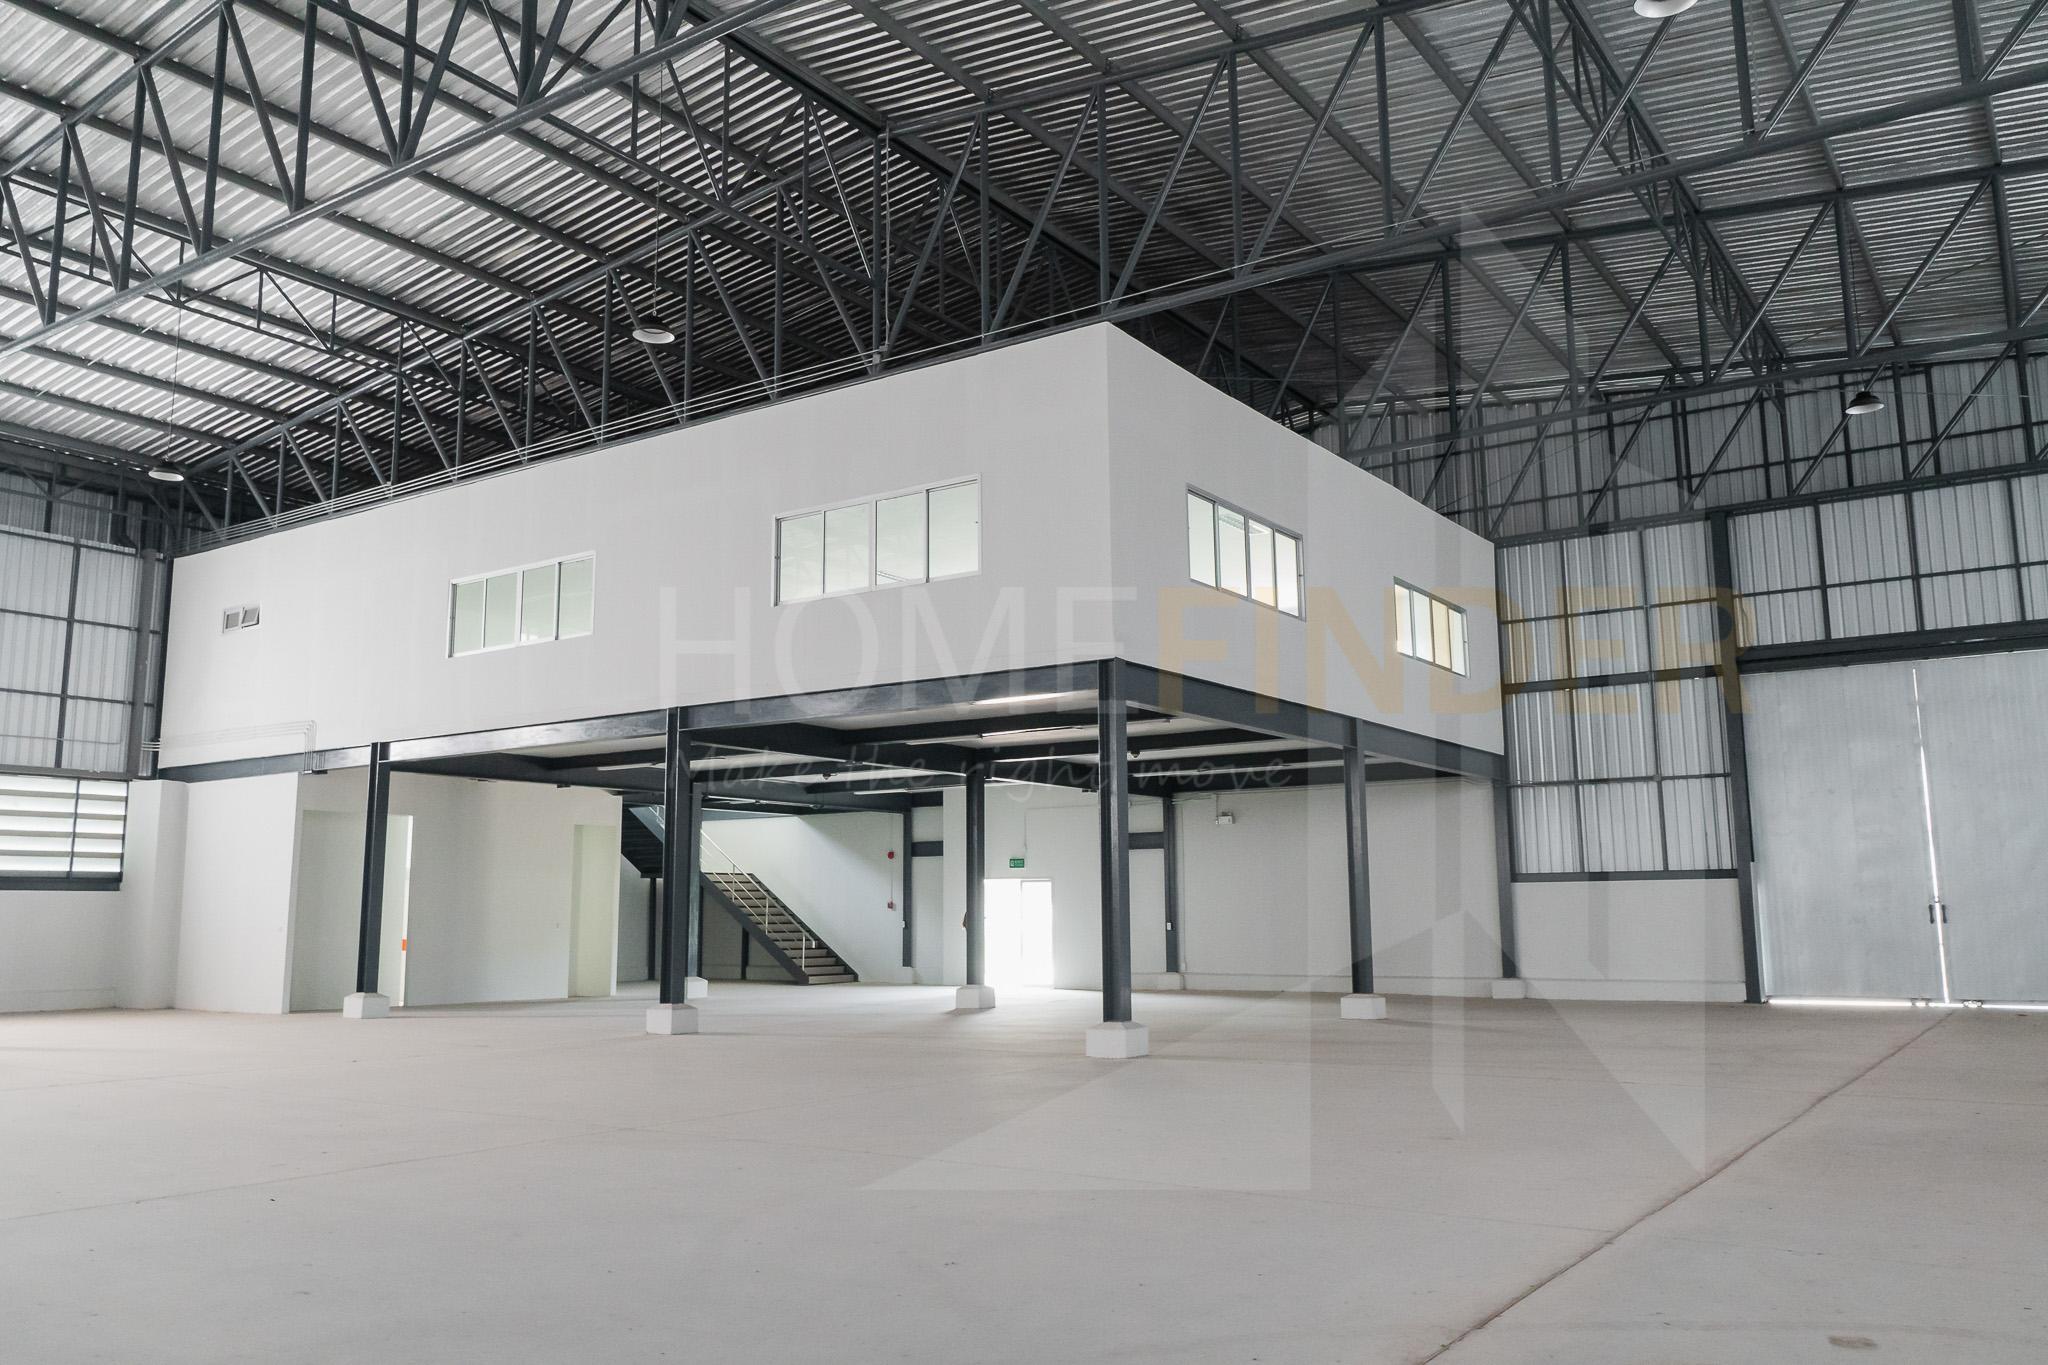 Chonburi Warehouse for rent